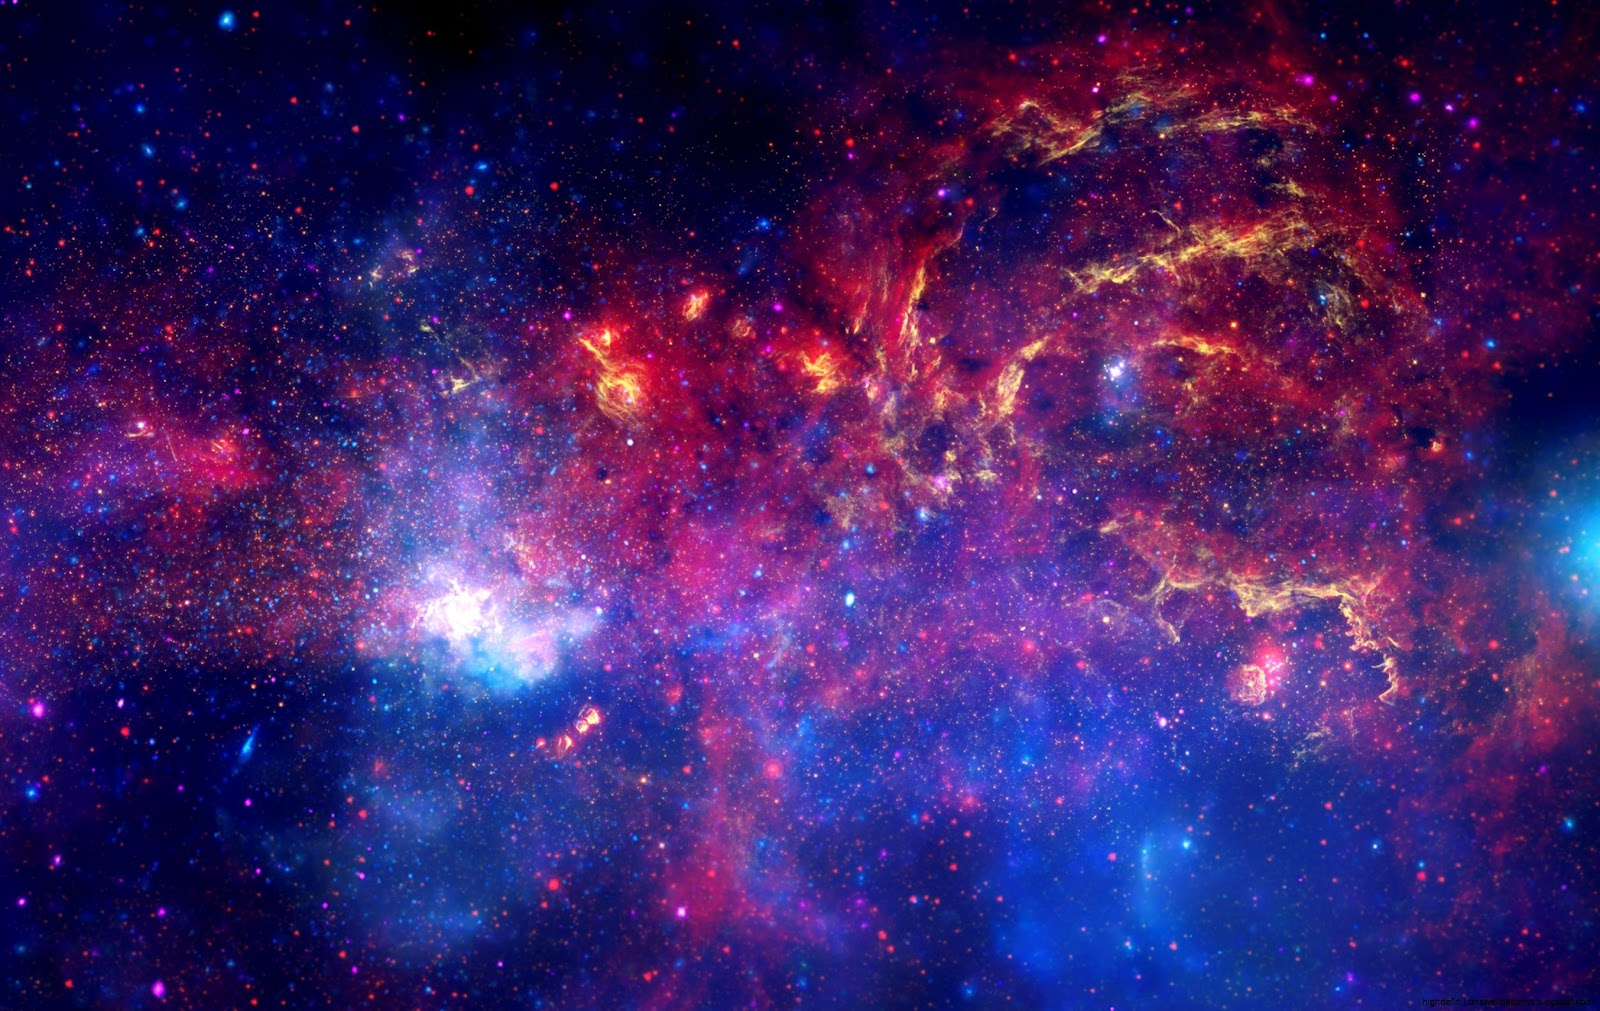 Space Nebula Purple Widescreen Hd Wallpaper   High ...